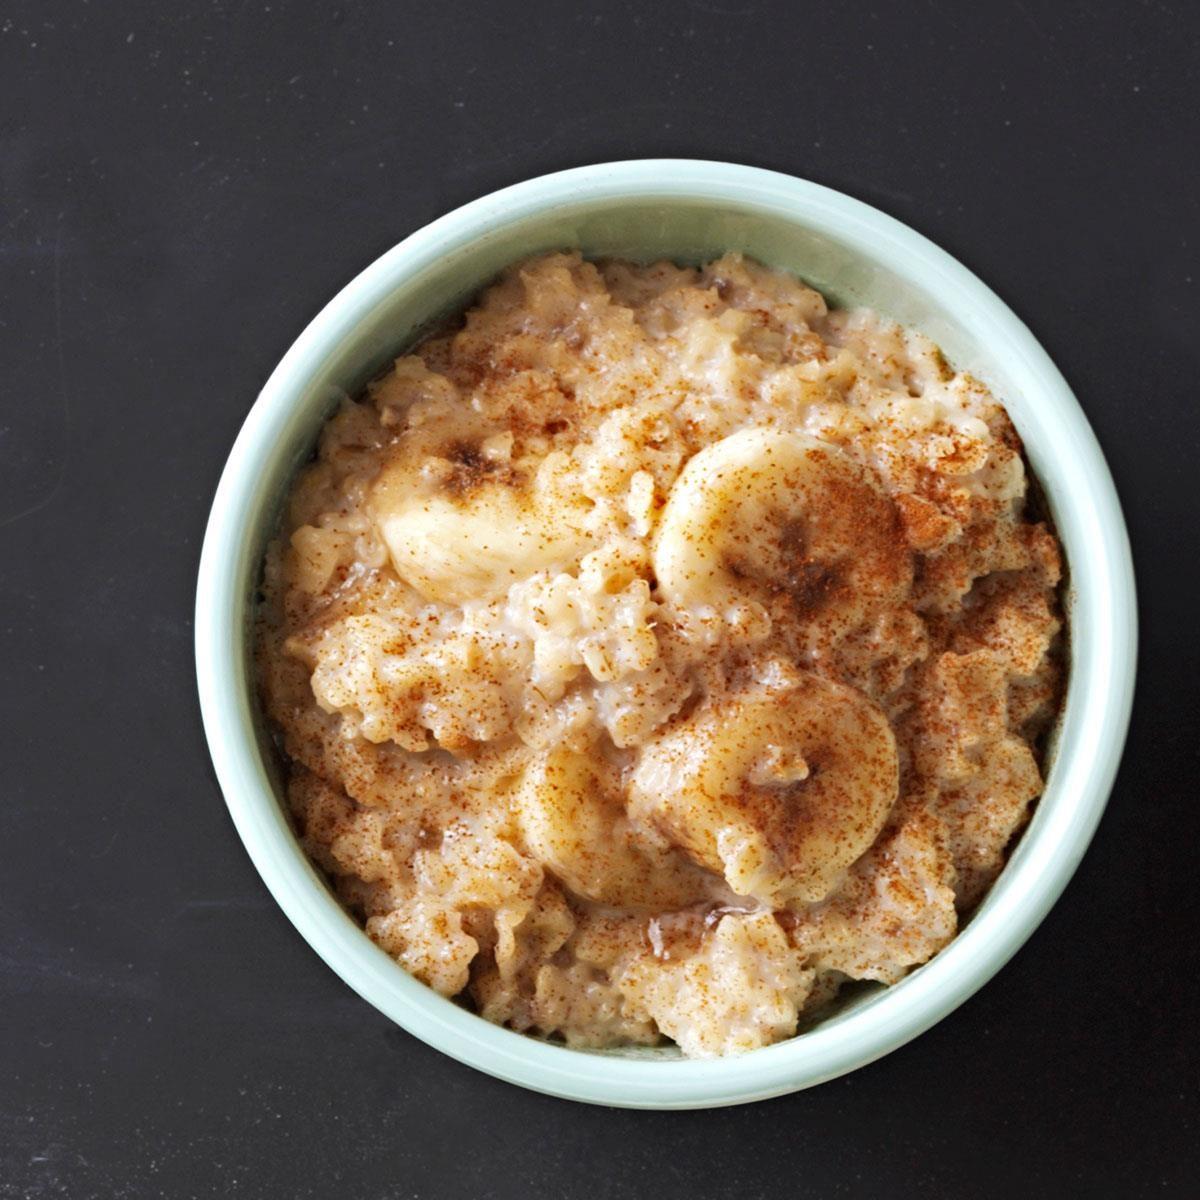 Brown sugar banana oatmeal